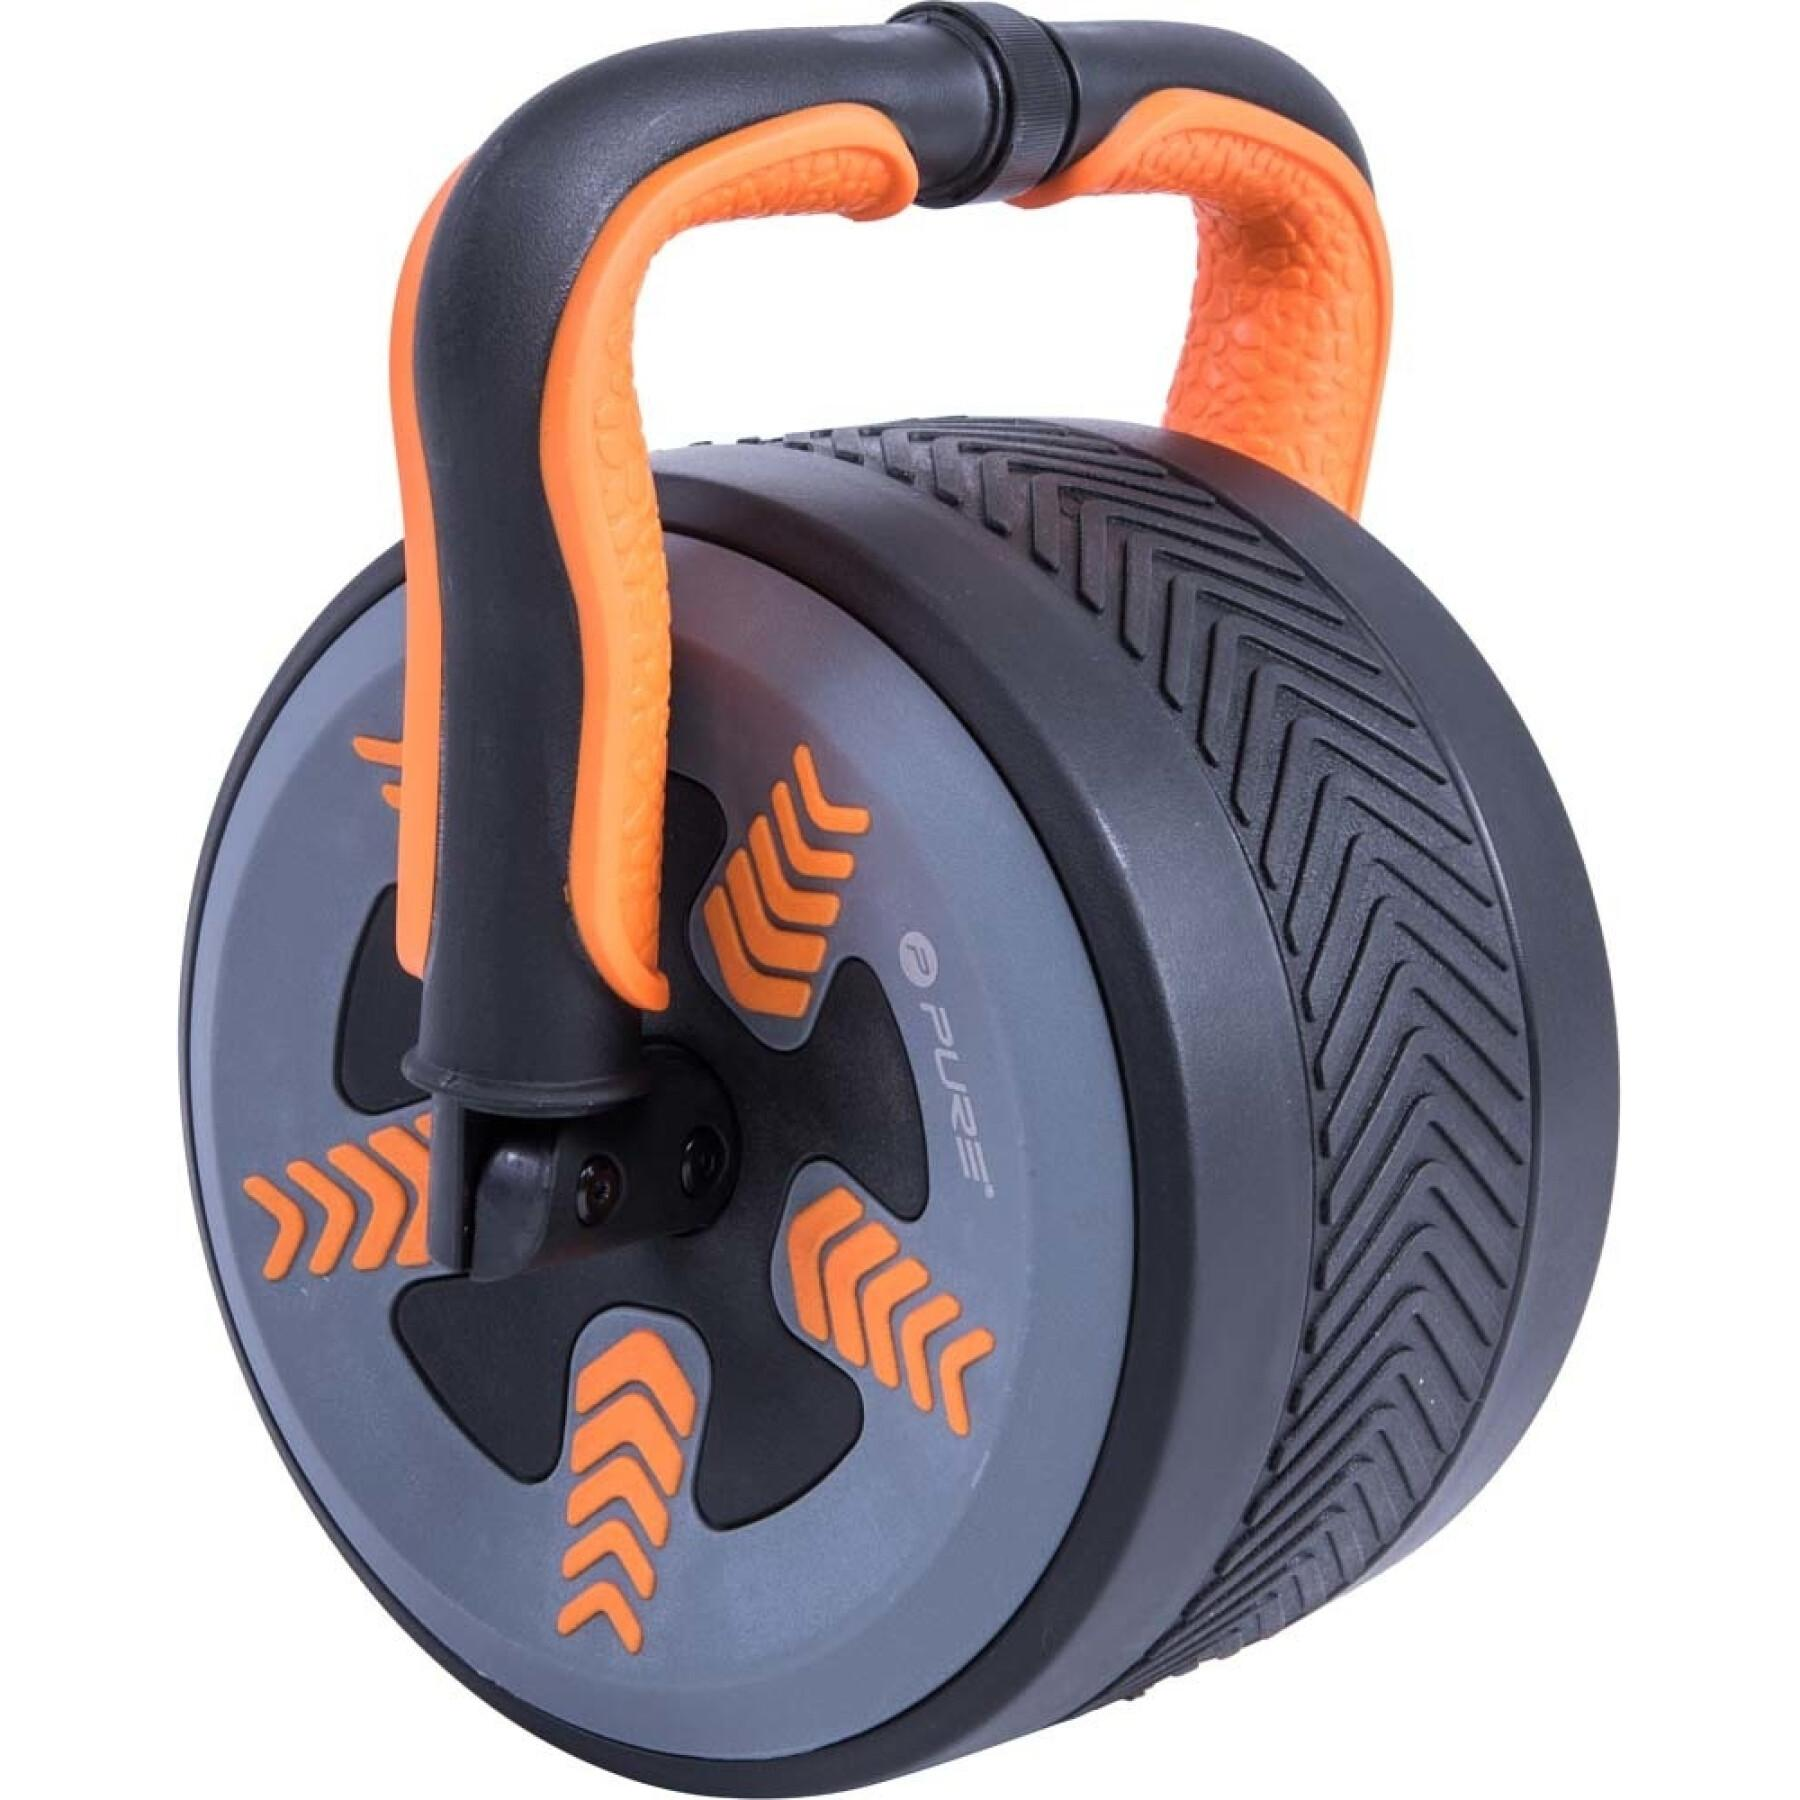 Abdominal wheel / kettlebell Pure2Improve